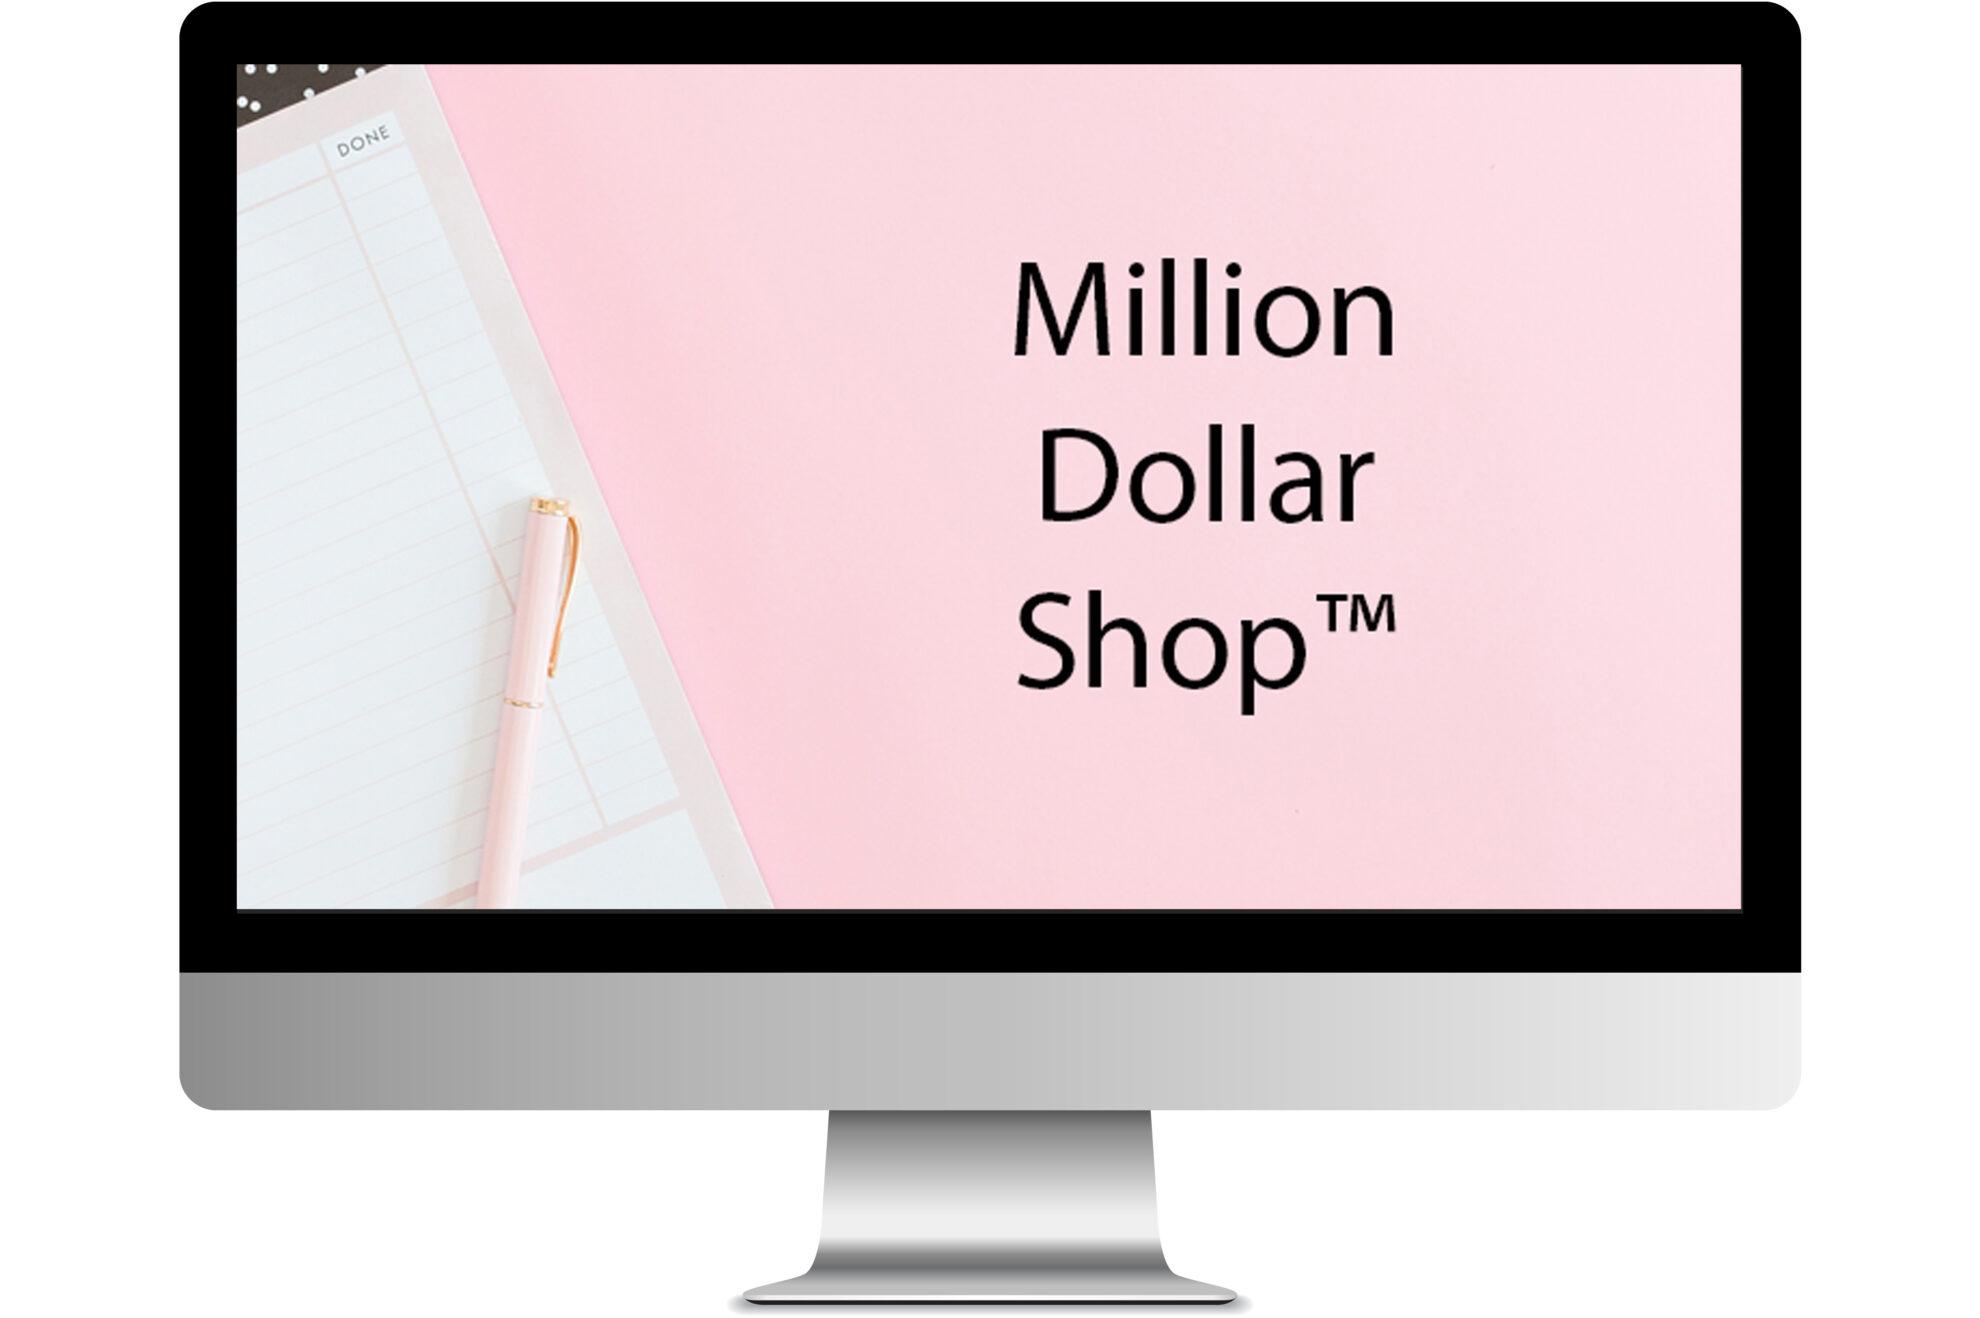 Million Dollar Shop™